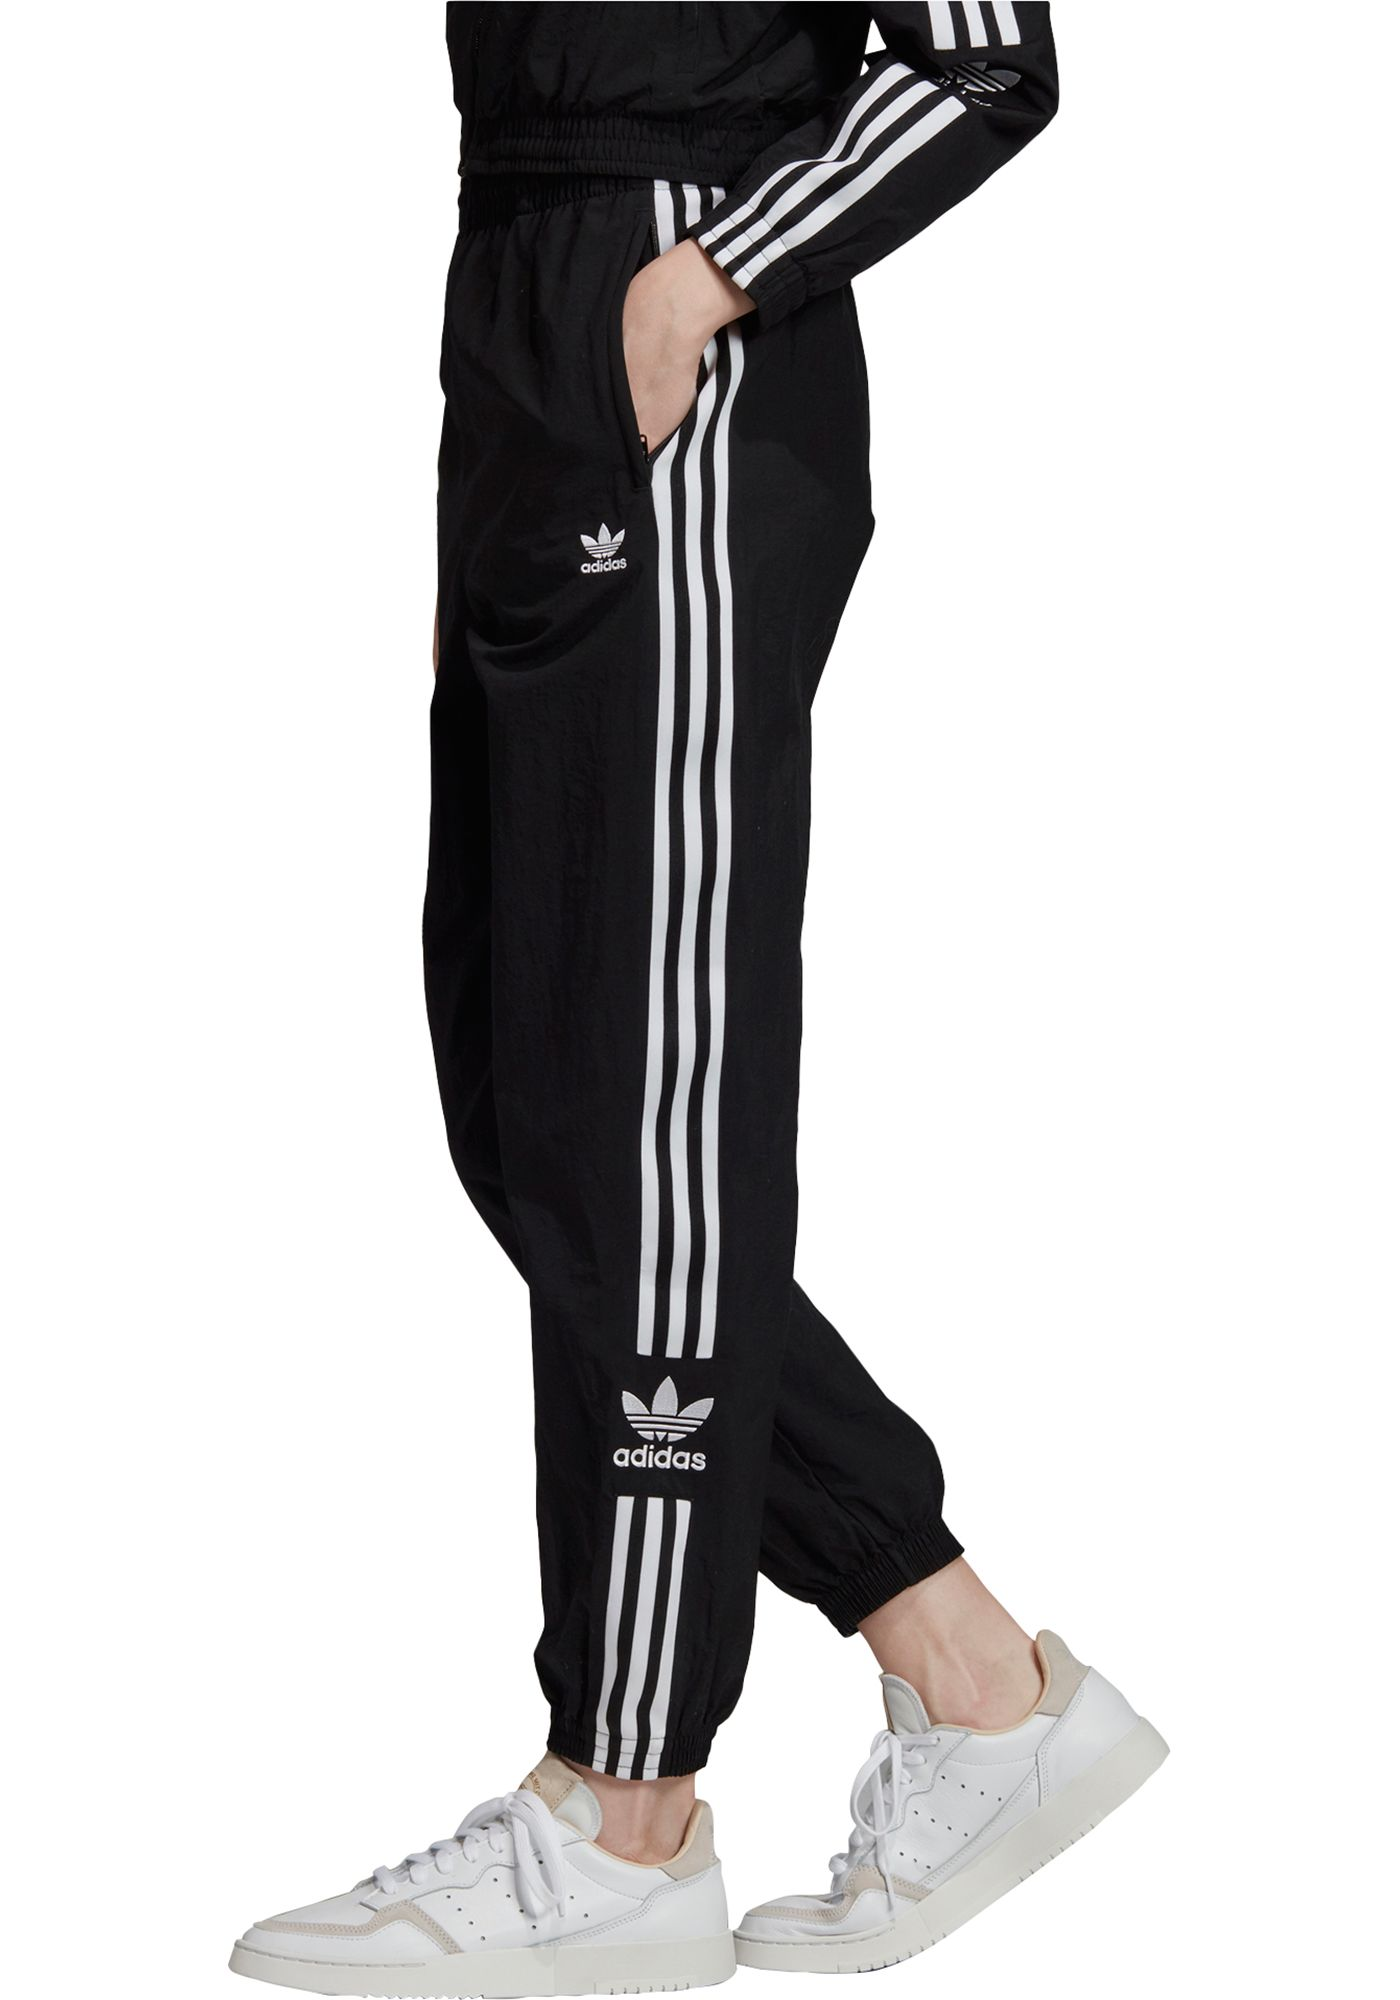 adidas Originals Women's Lock Up Track Pants